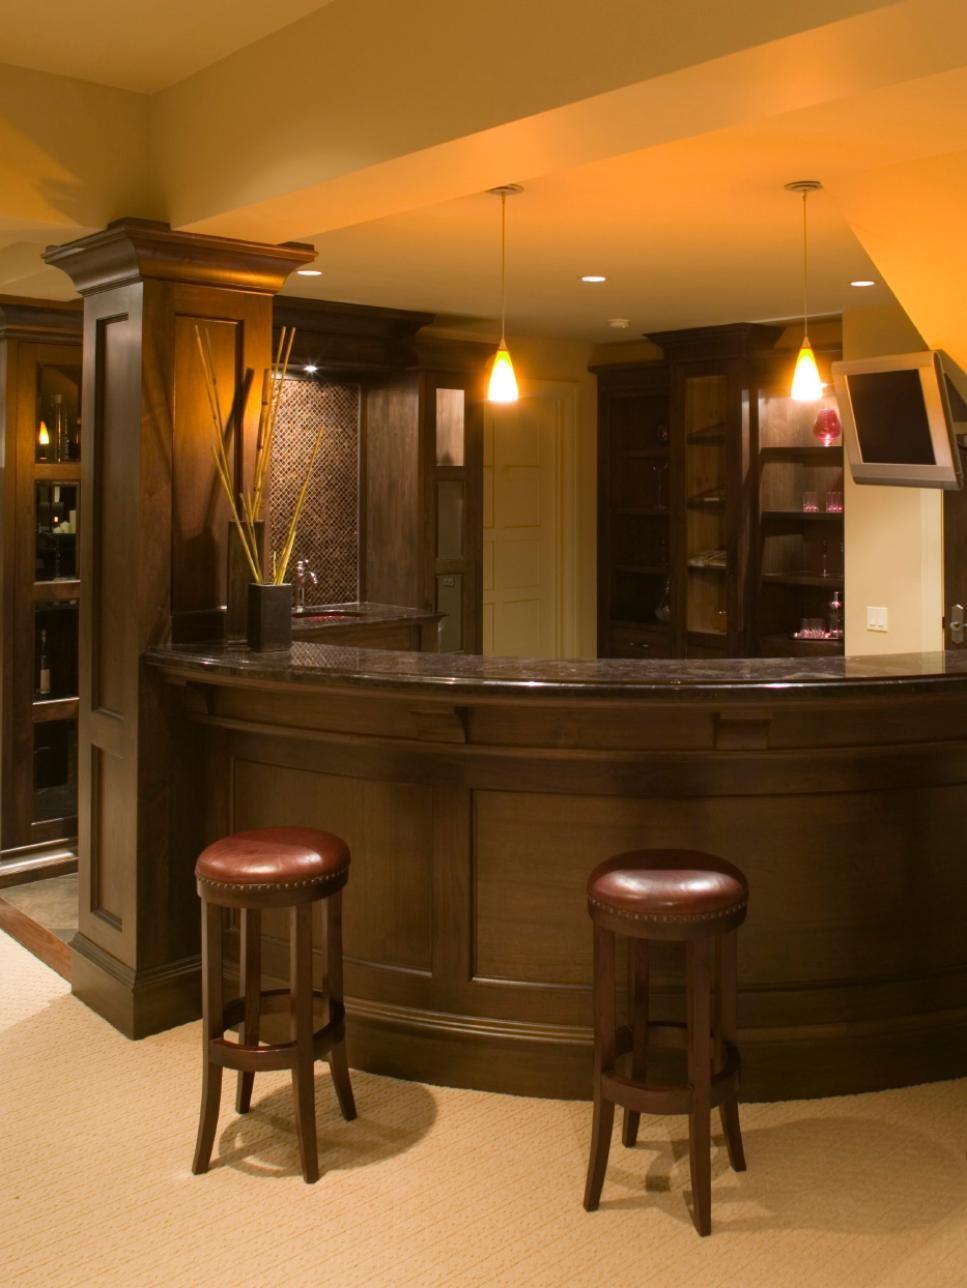 Home Bar Ideas 89 Design Options Bar En Casa Bares En El Hogar Cantinas De Madera